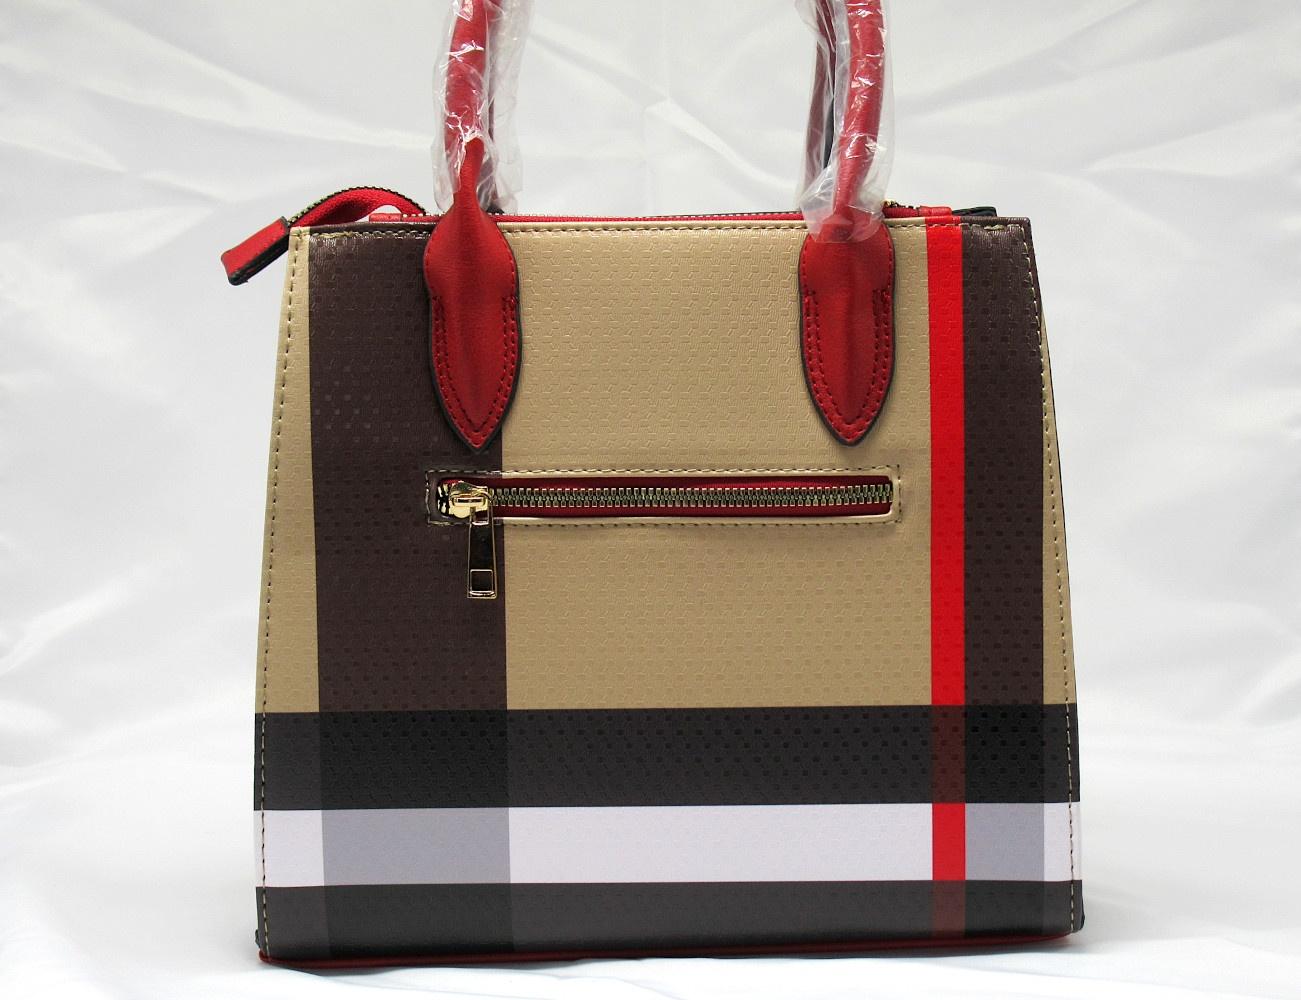 BAG1_Red and Plaid Check Padlock 2-in-1 Bag-back1